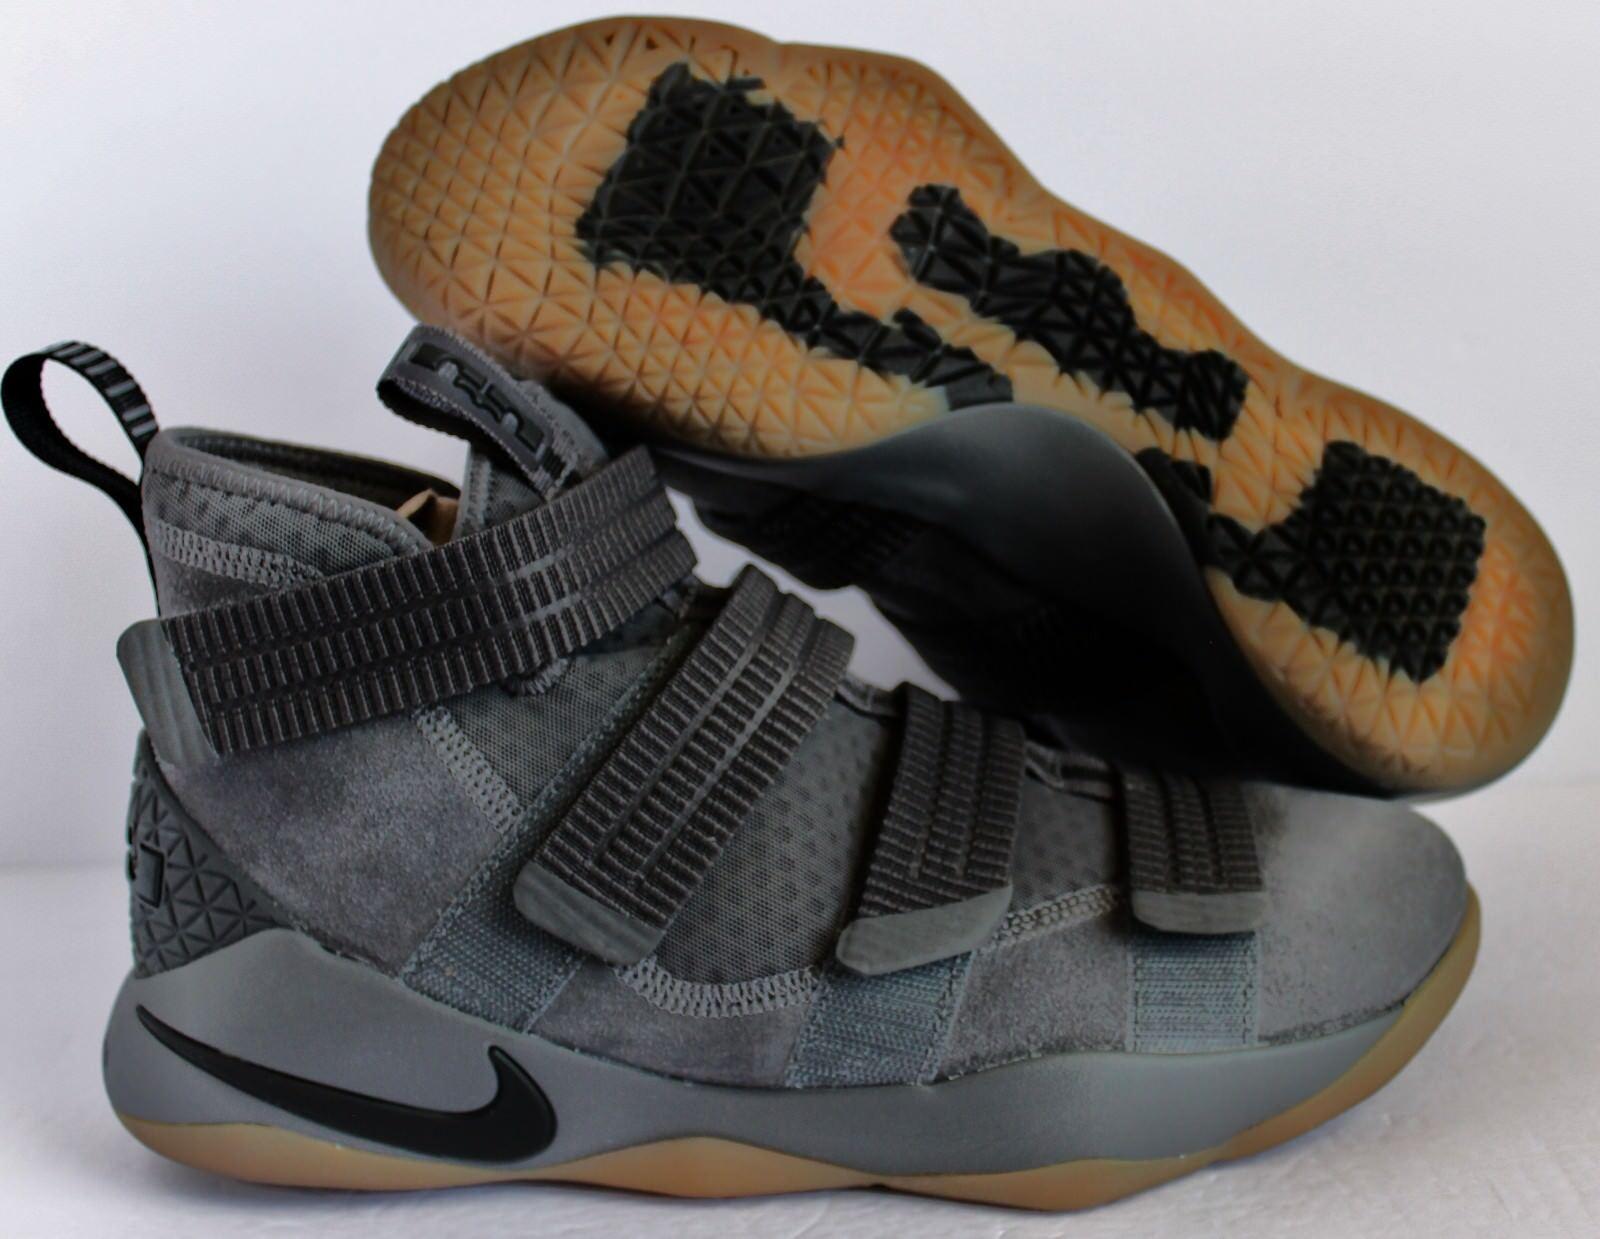 pretty nice a2474 995b6 Nike lebron james soldat xi sfg dunkle grau - - - schwarz - braunen sz 10   897646-003  00a765